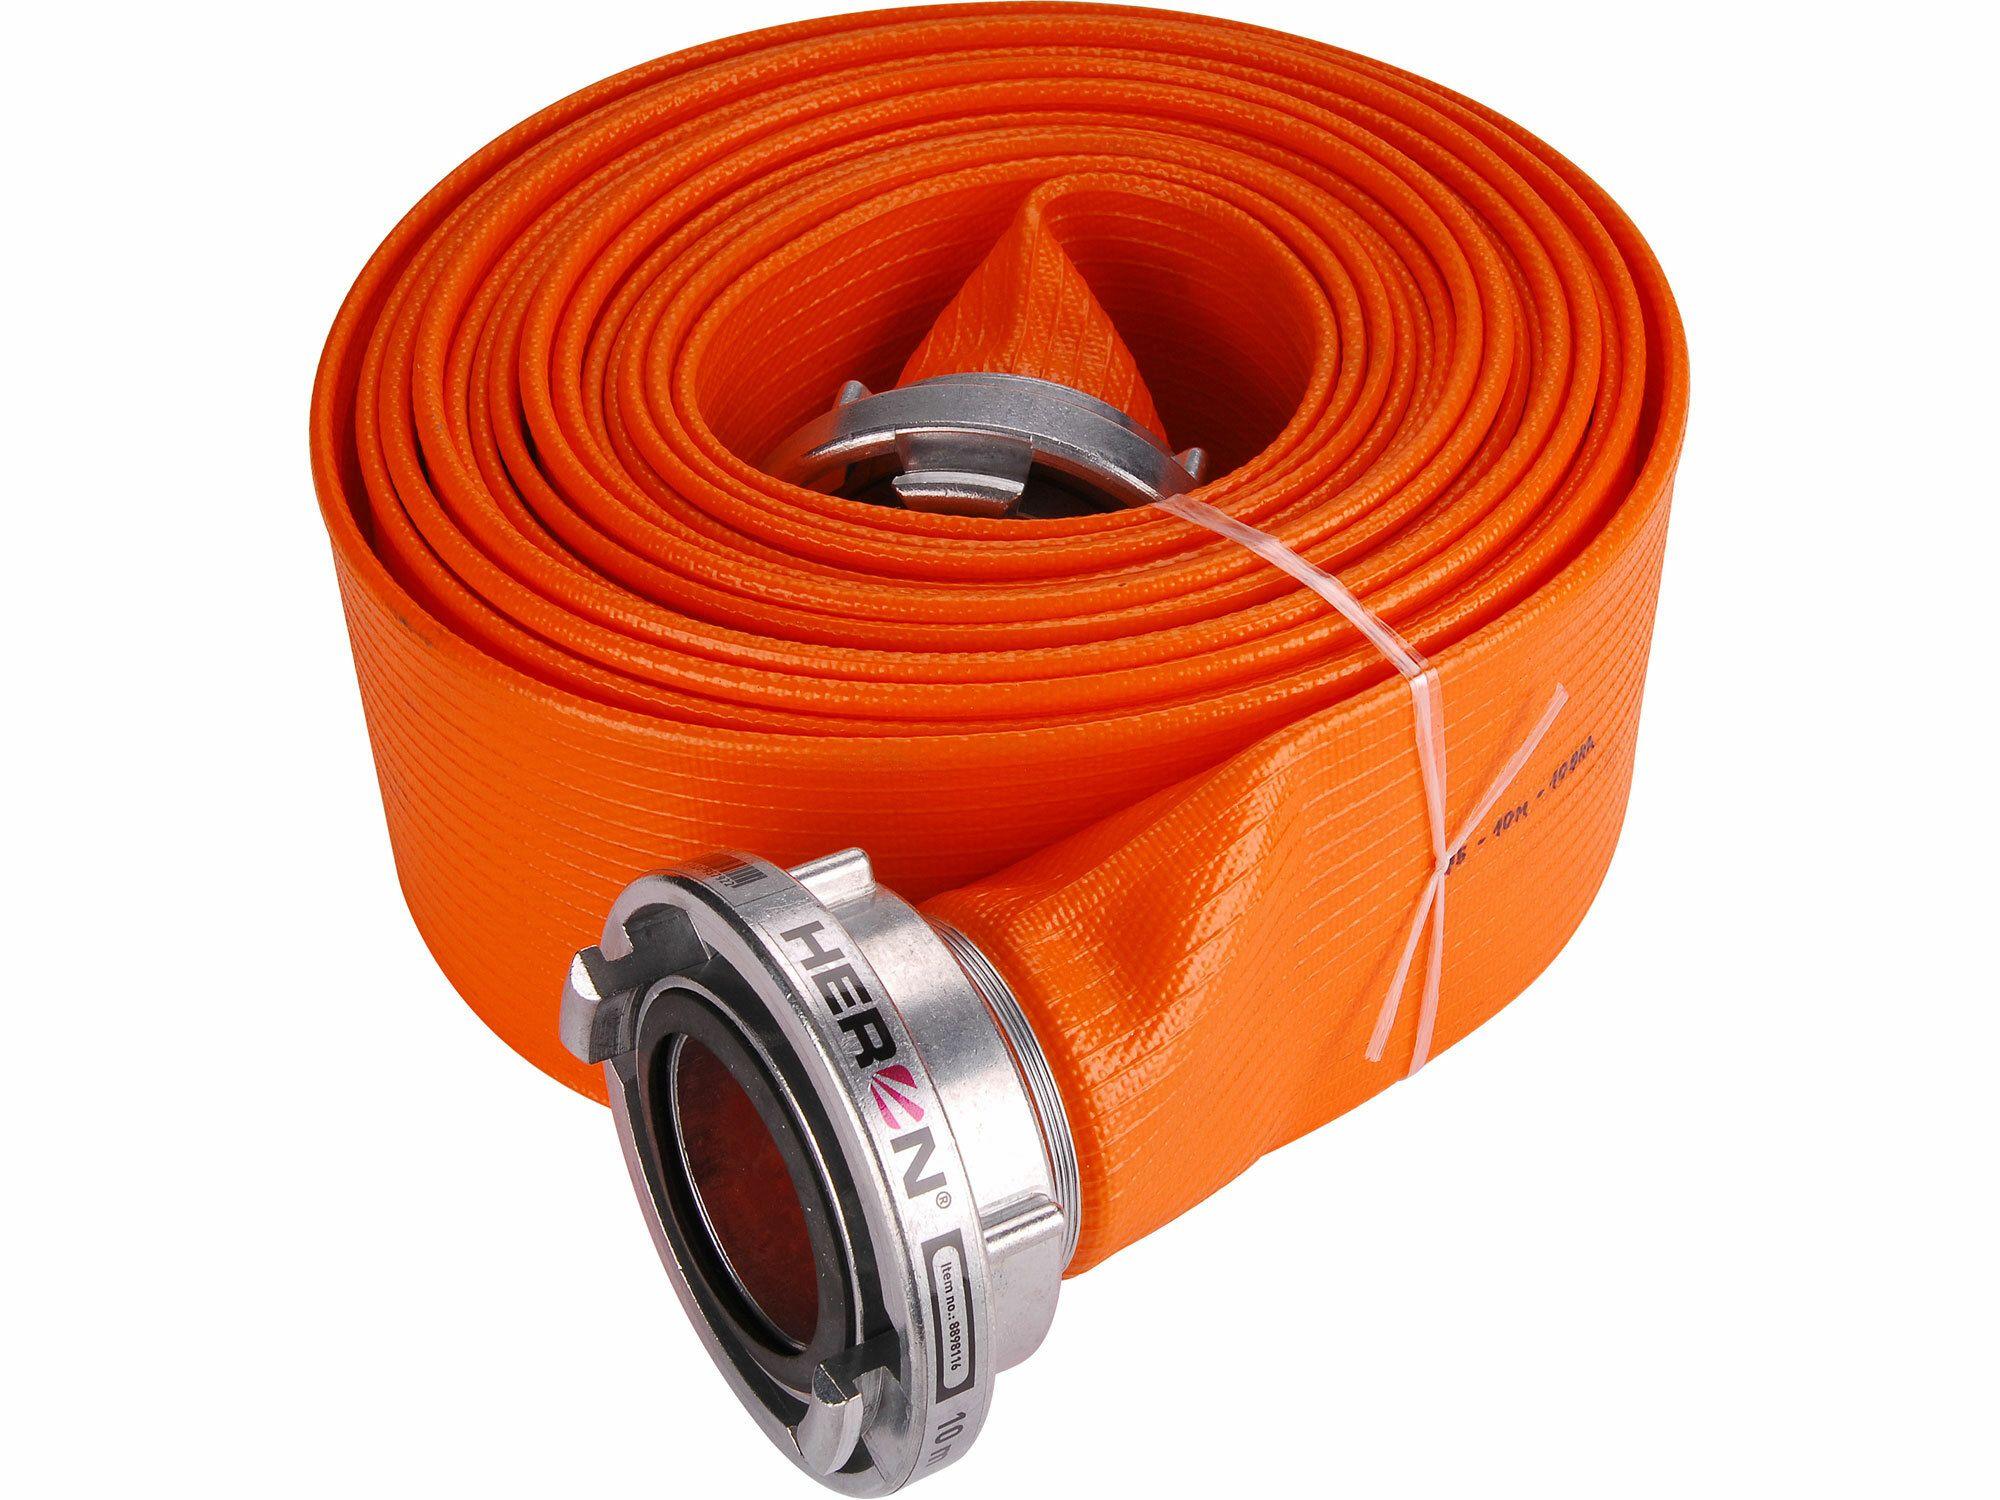 "Hadice B75 PVC Orange 10m se spojkami. 3"". 10m. pro 8895106. 8895105. 8895102 HERON"